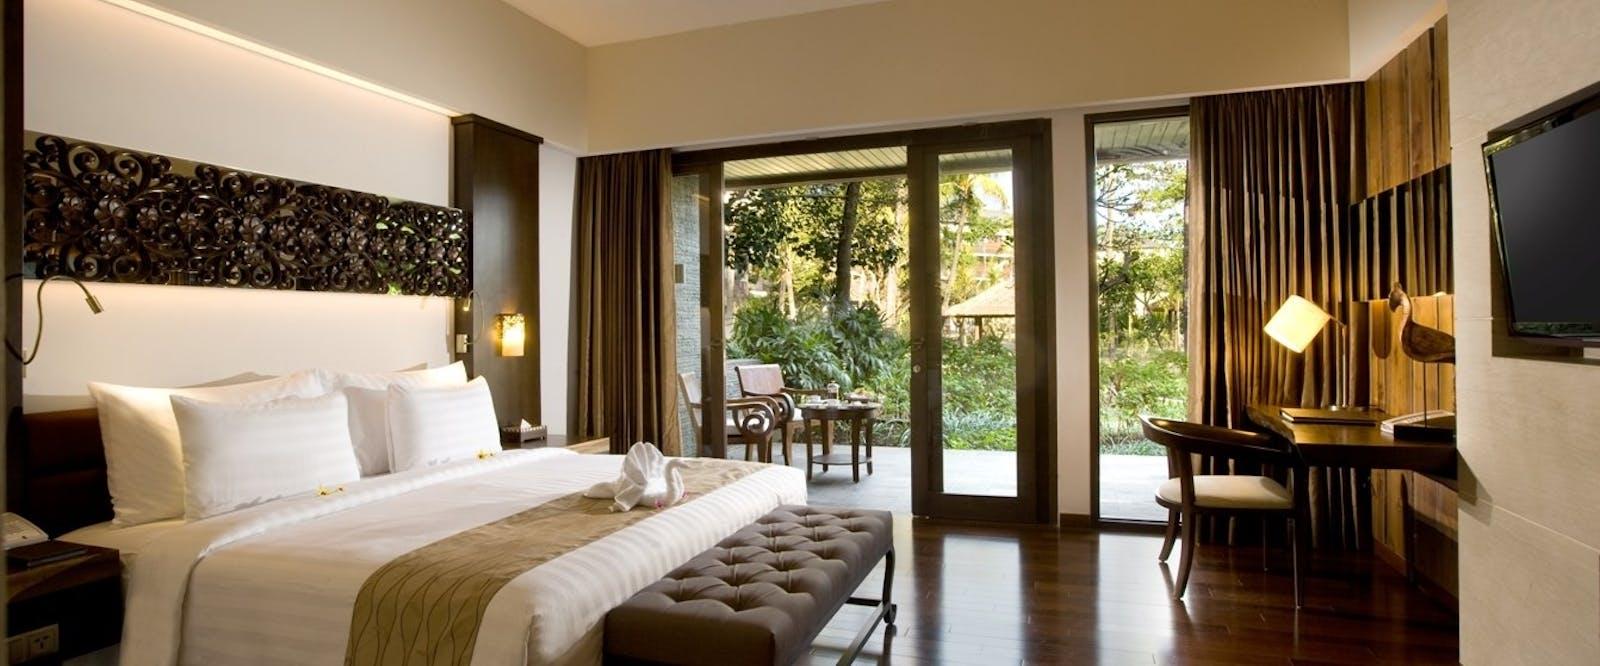 4 12 Guest Bedroom At The Seminyak Beach Resort Spa